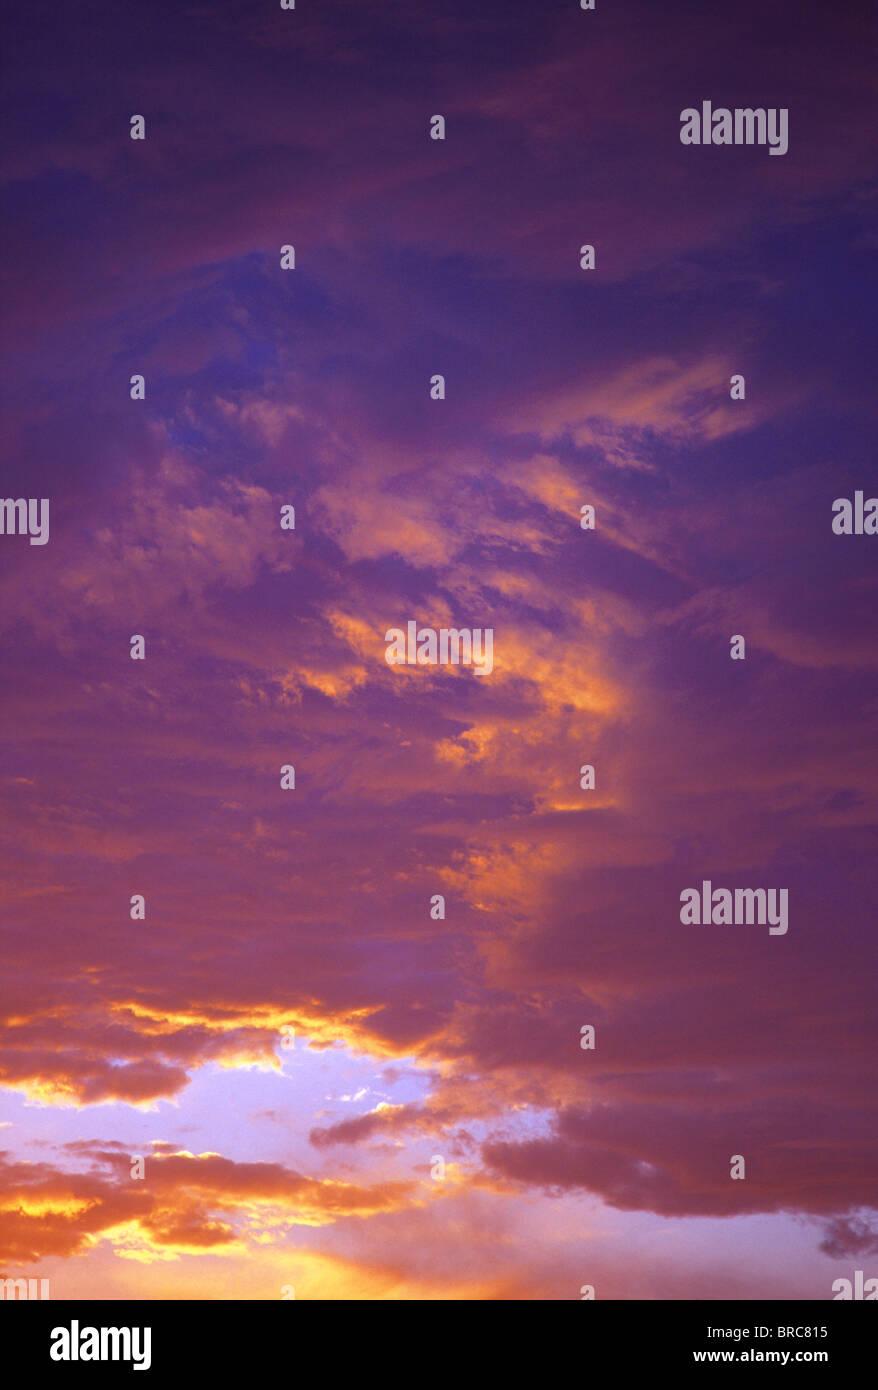 Wolken bei Sonnenuntergang in Big Bend Nationalpark, Texas, USA. Stockbild